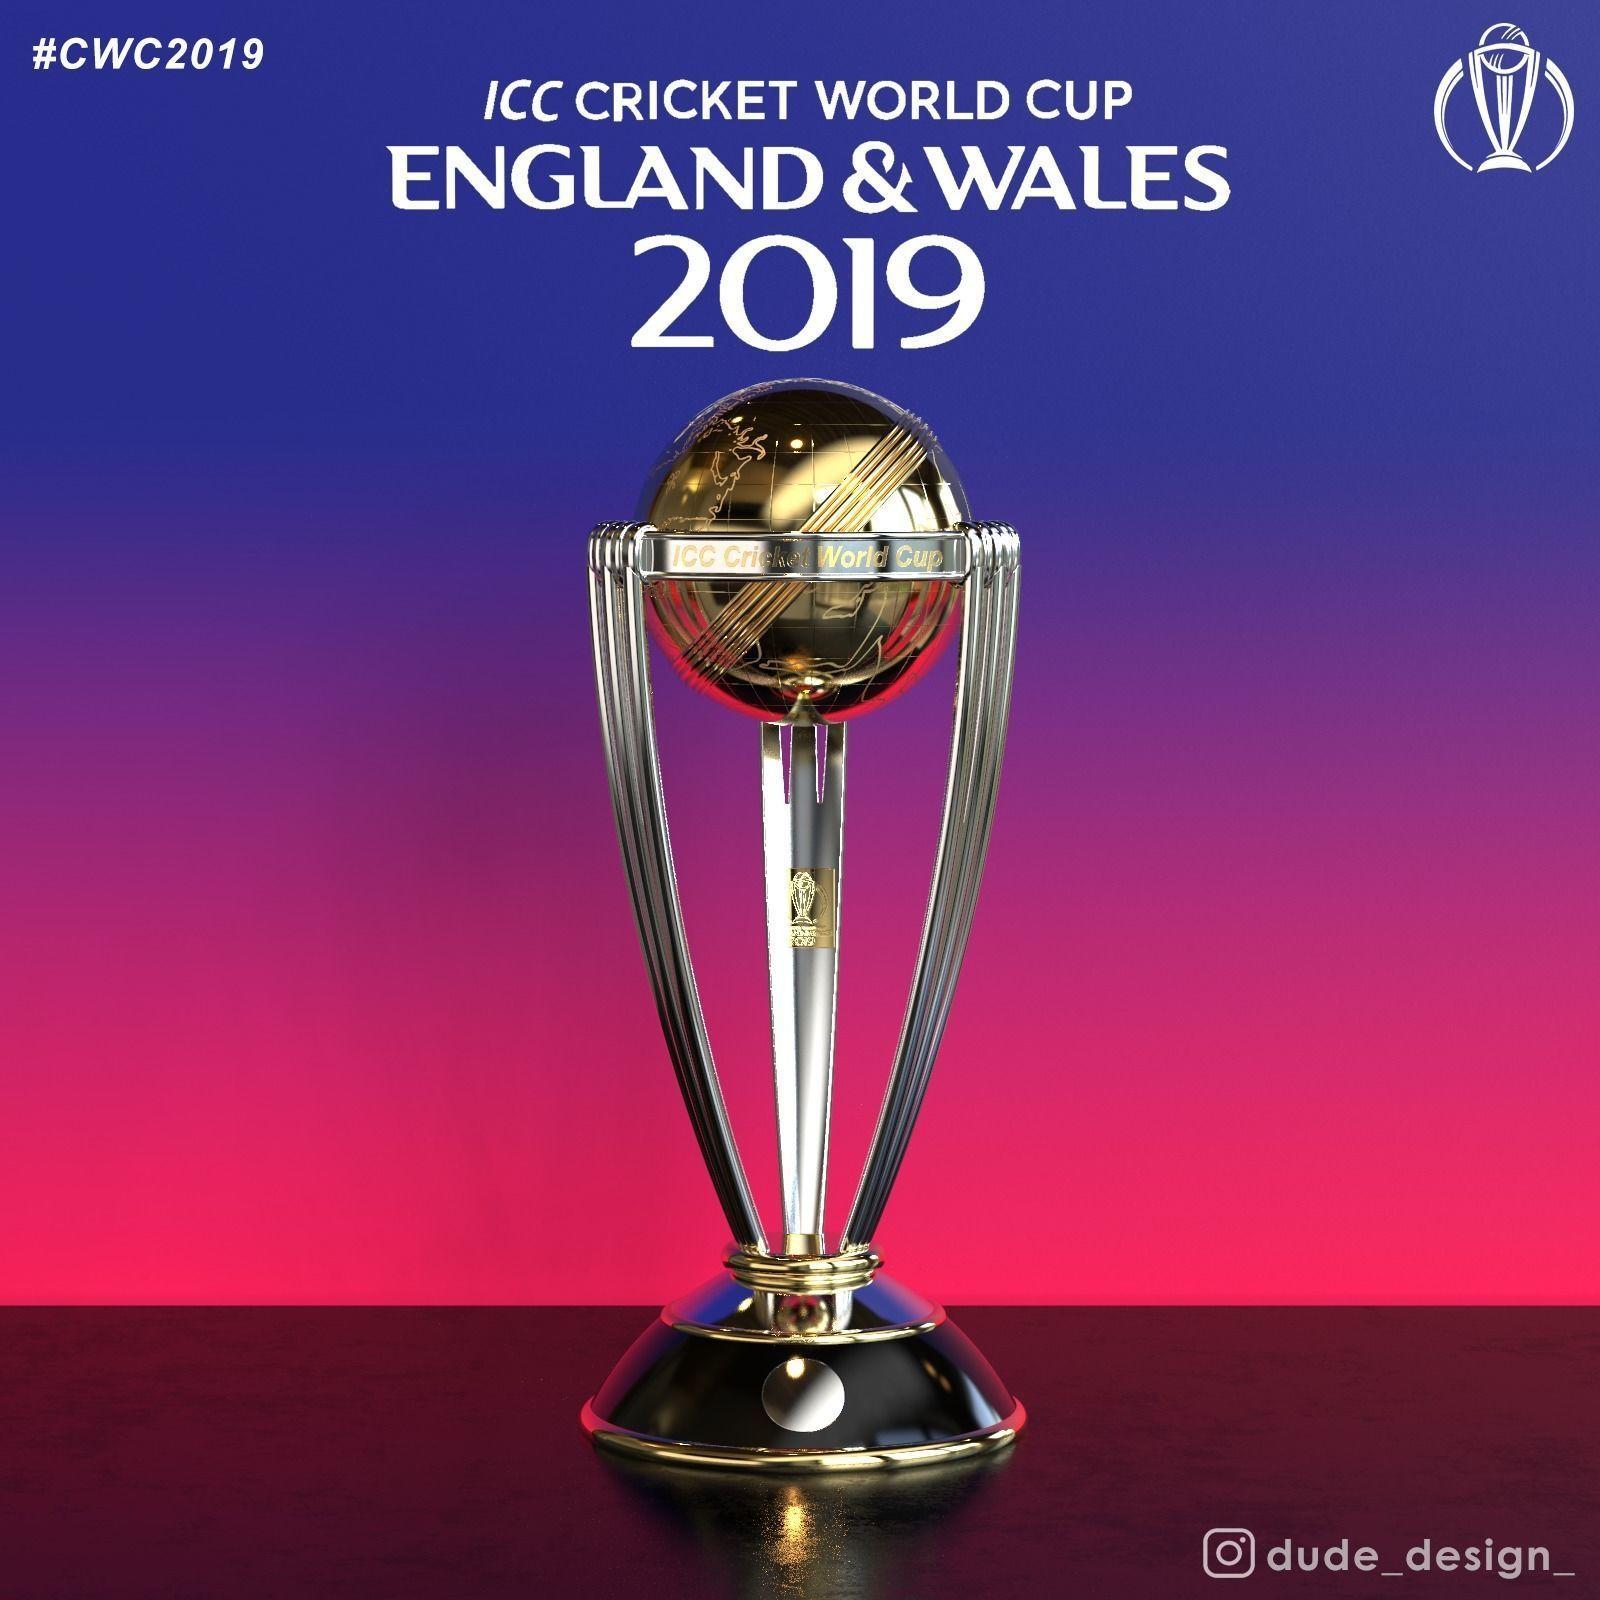 ICC Cricket World Cup Trophy | 3D model